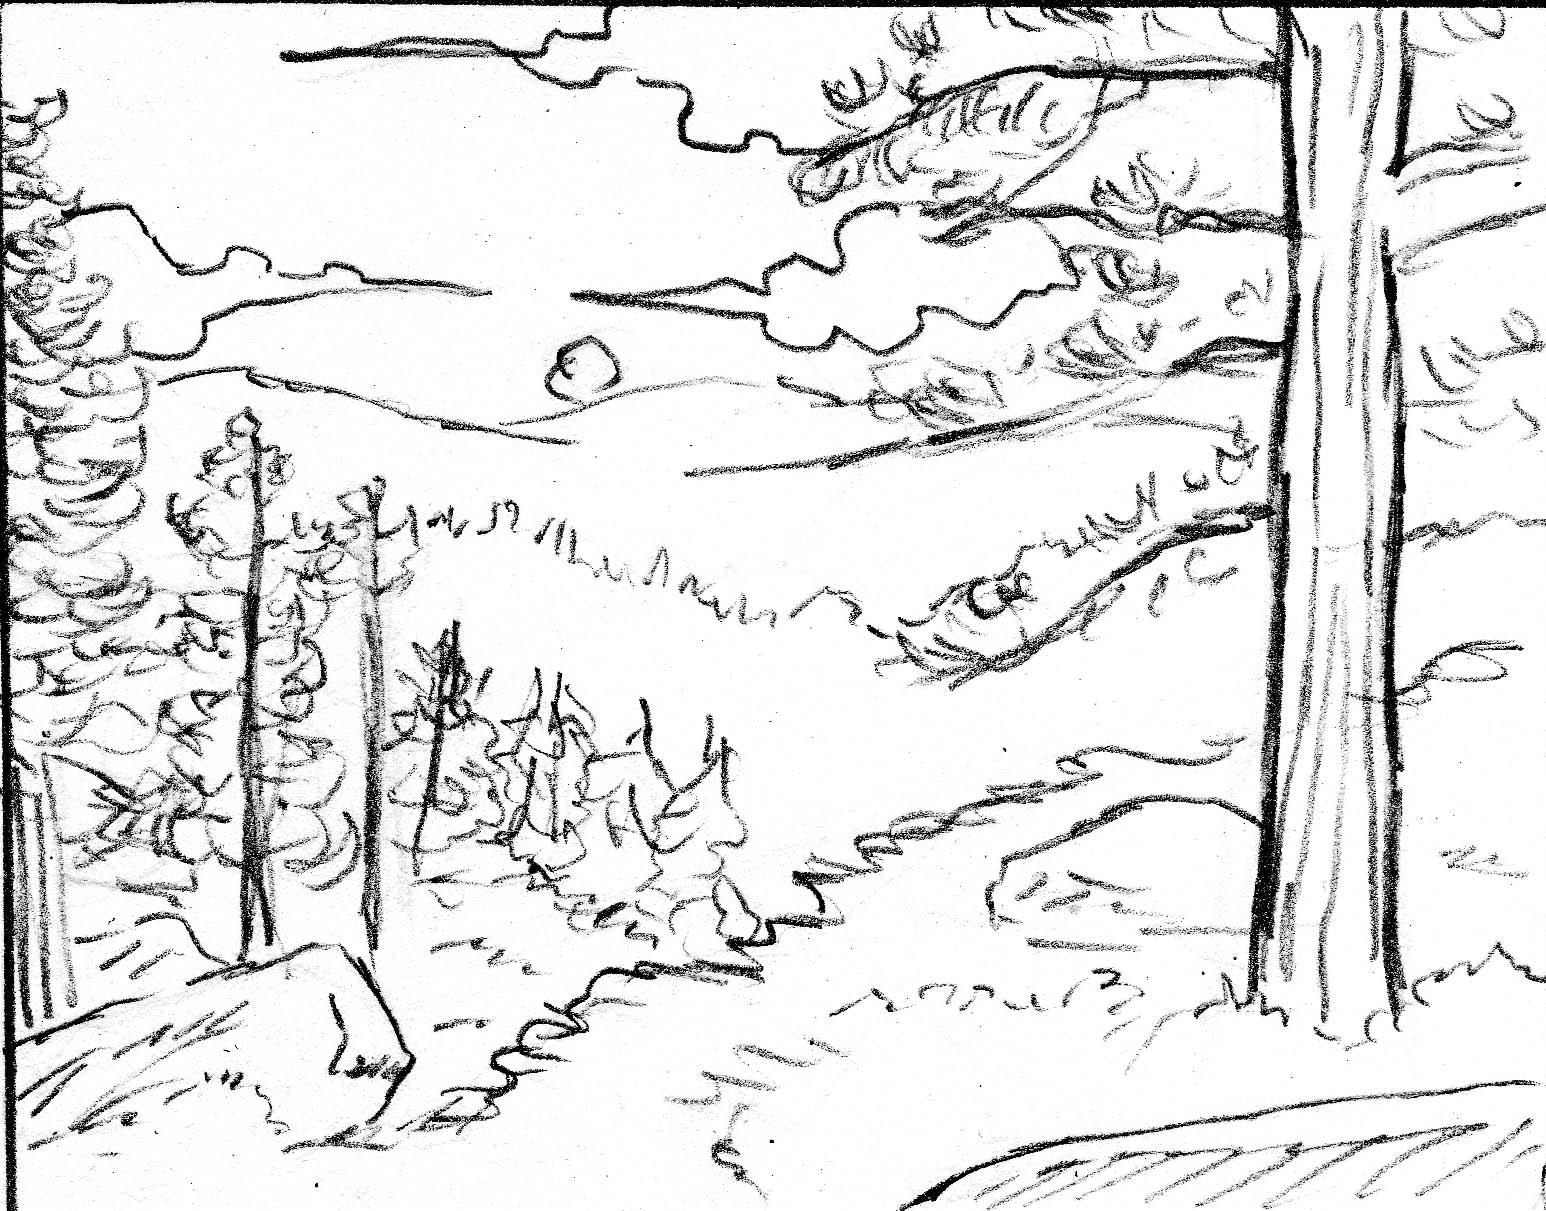 Dibujos Para Colorear De Un Paisaje: Dibujo De Paisaje Con Lineas